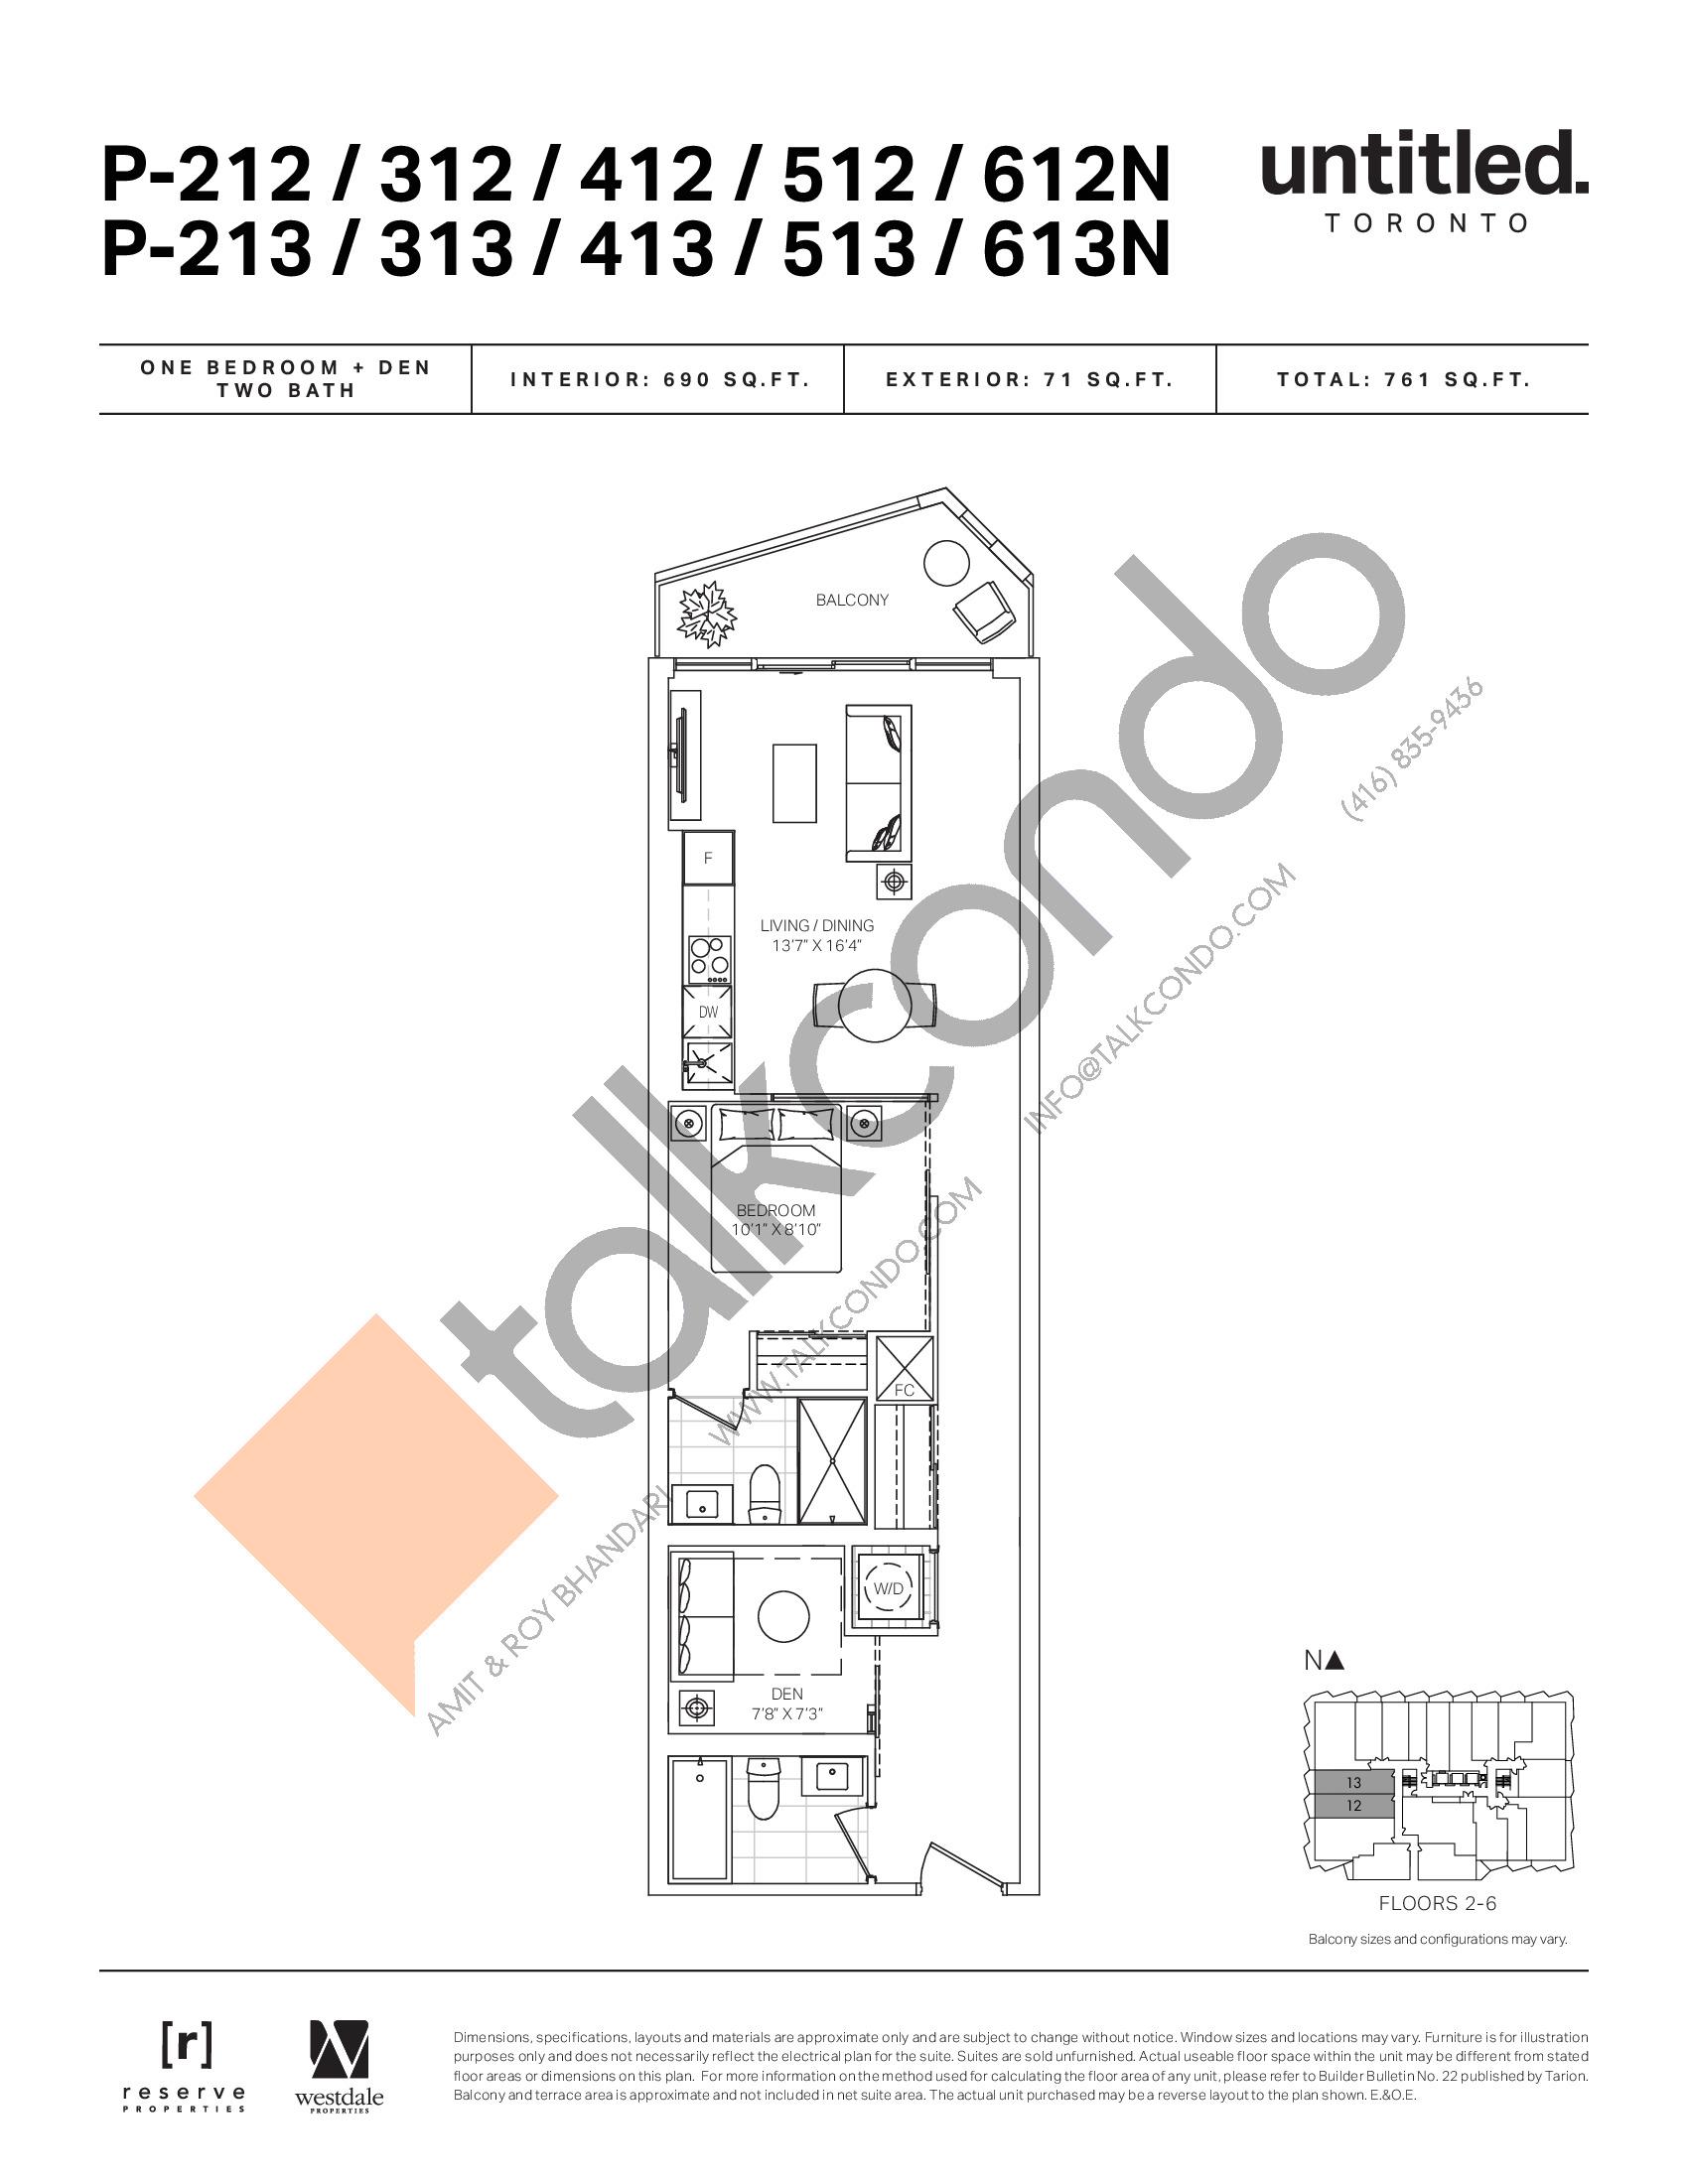 P-212/312/412/512/612N P-213/313/413/513/613N Floor Plan at Untitled North Tower Condos - 690 sq.ft